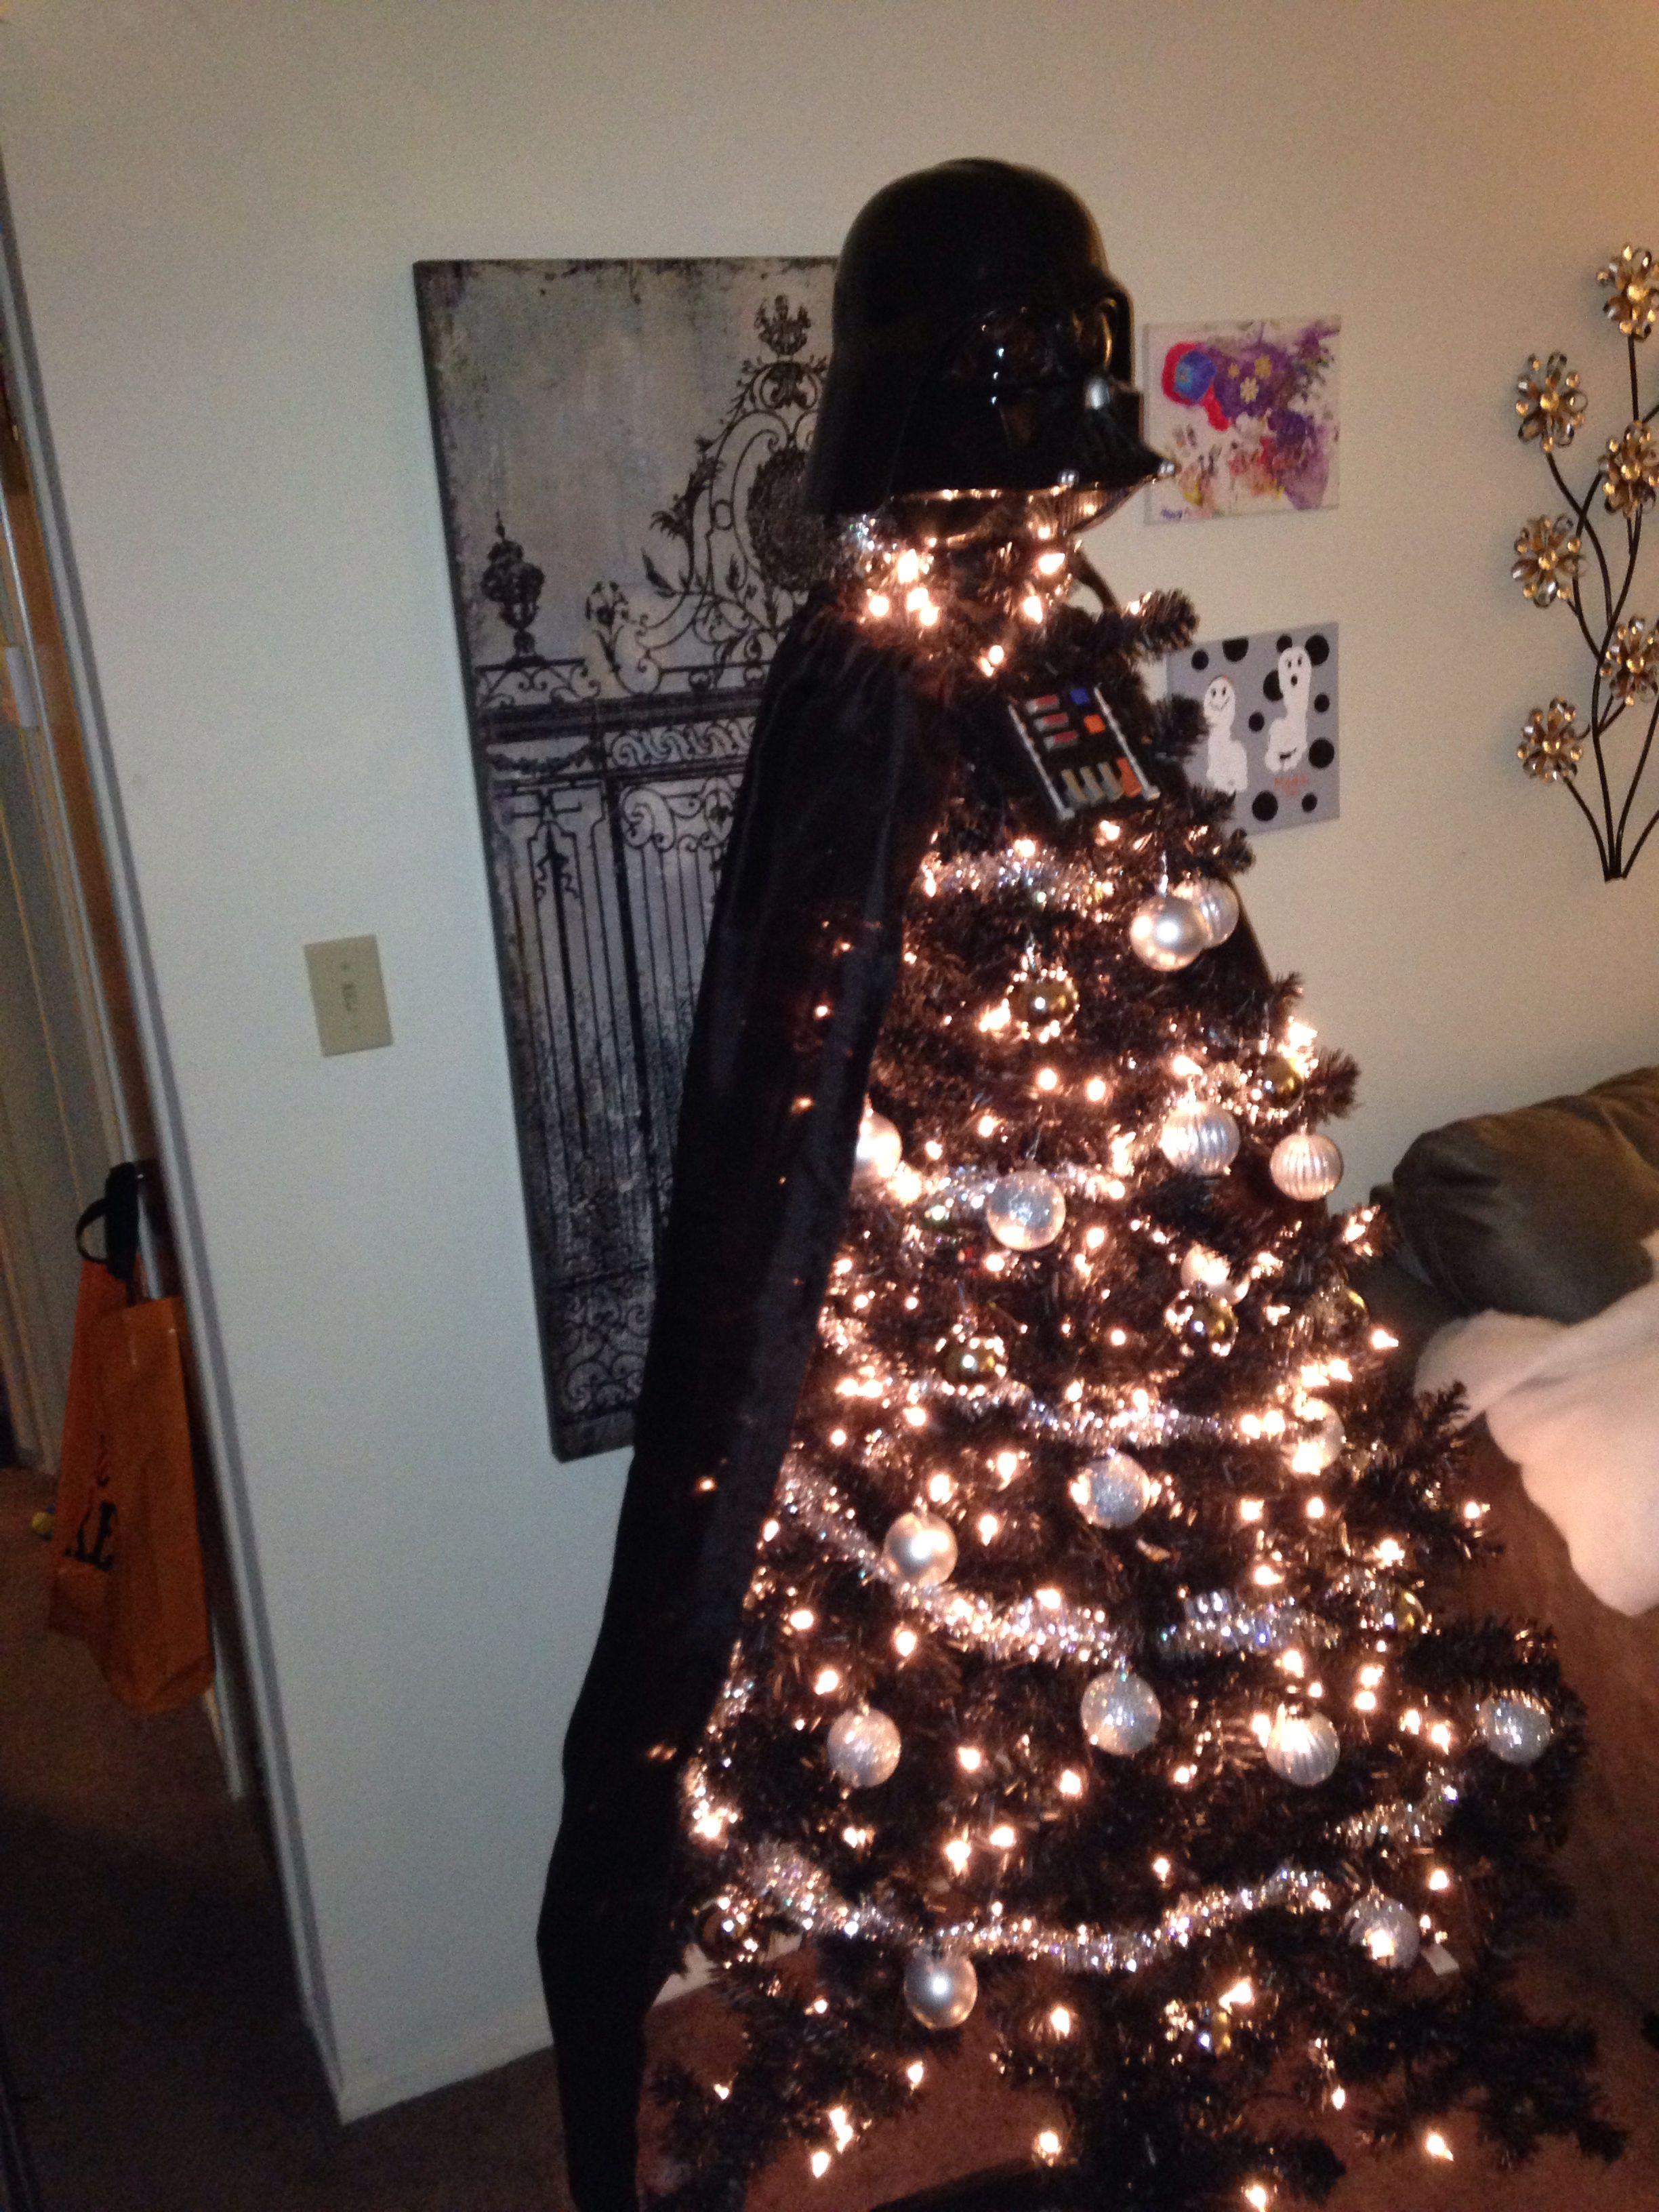 Darth Vader Christmas Tree Elegant Christmas Centerpieces Disney Christmas Tree Elegant Christmas Trees